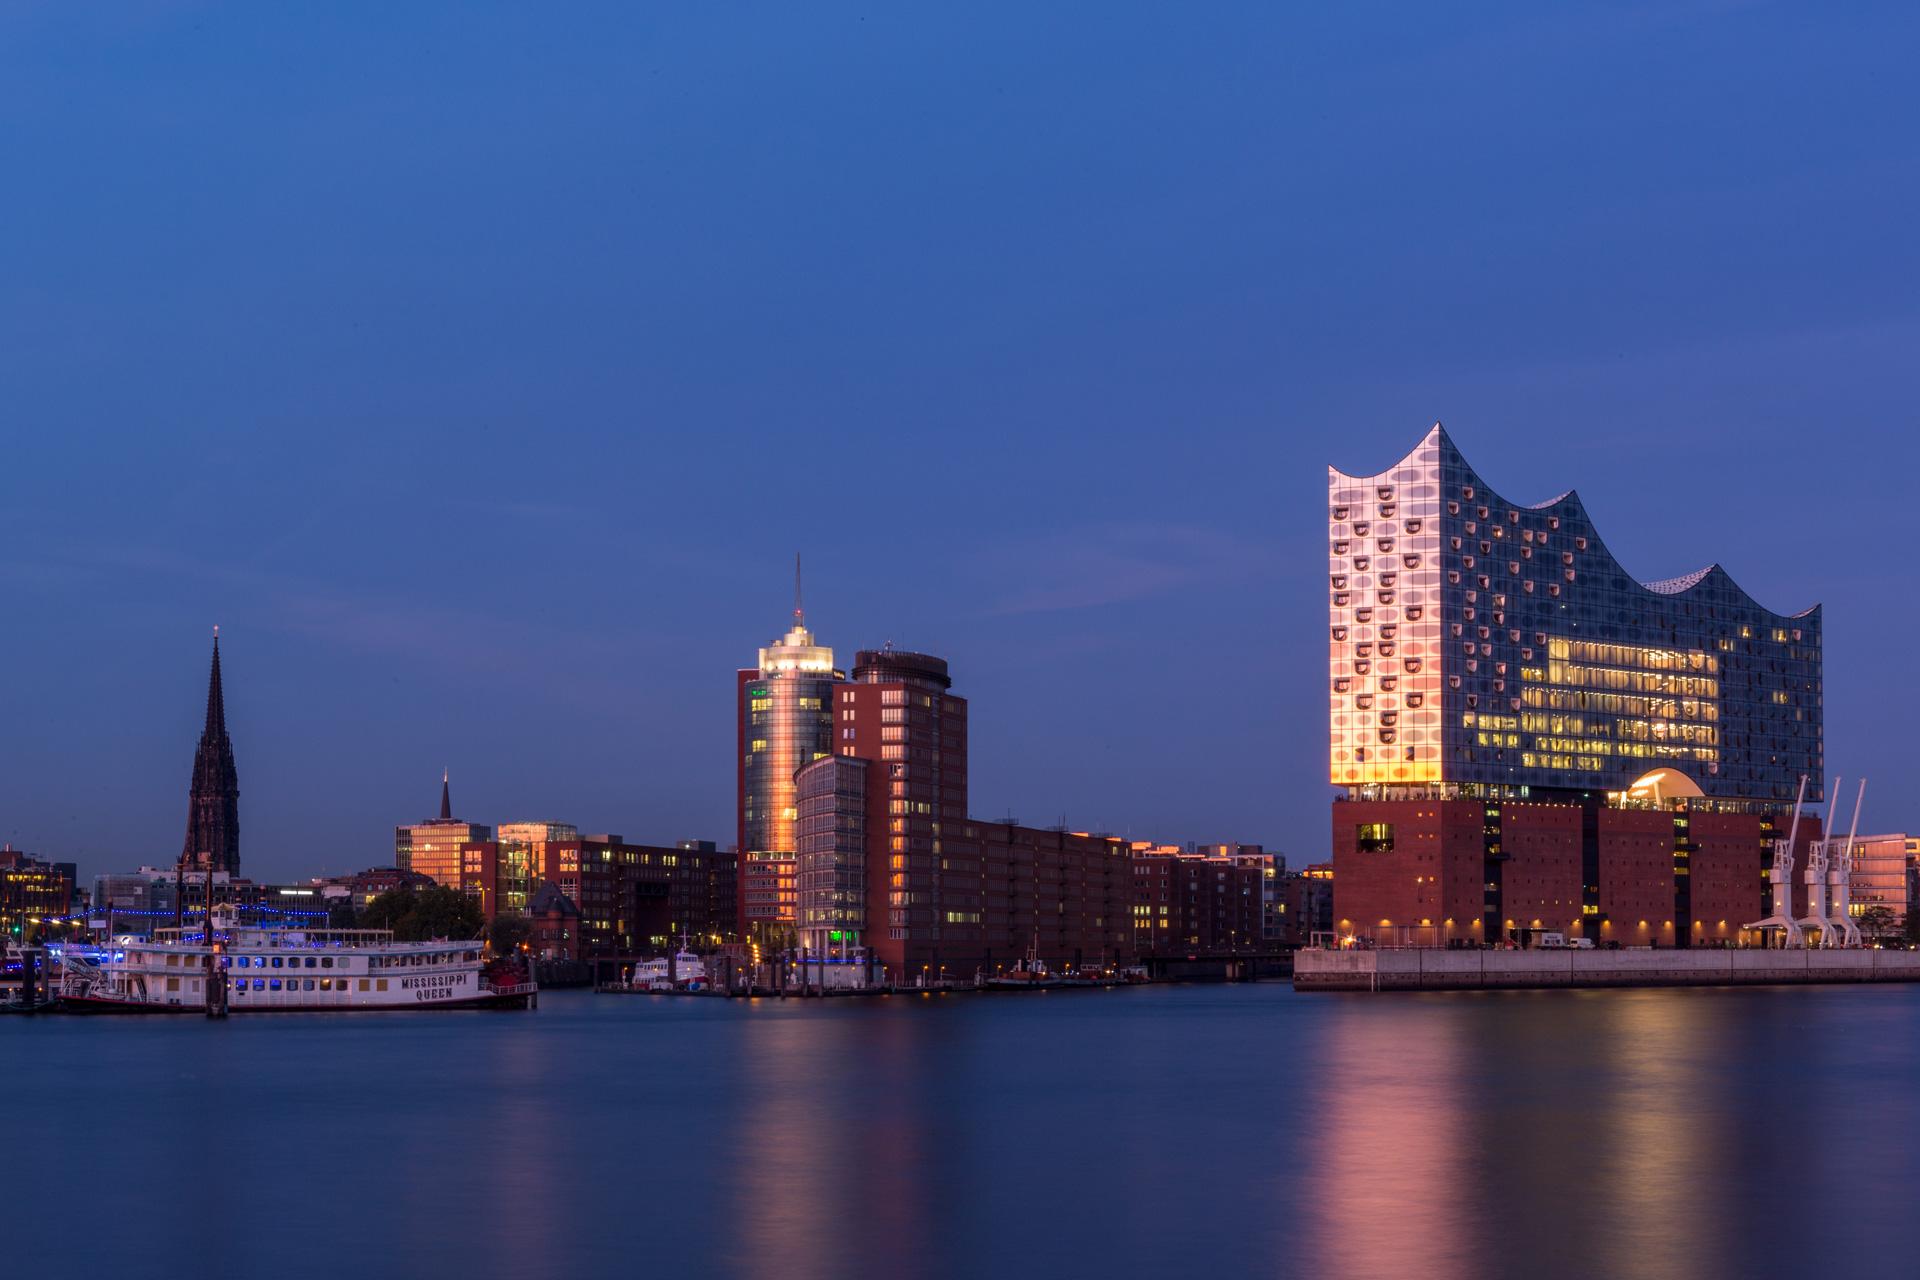 Hamburg Bilder - Wunschbilder.com